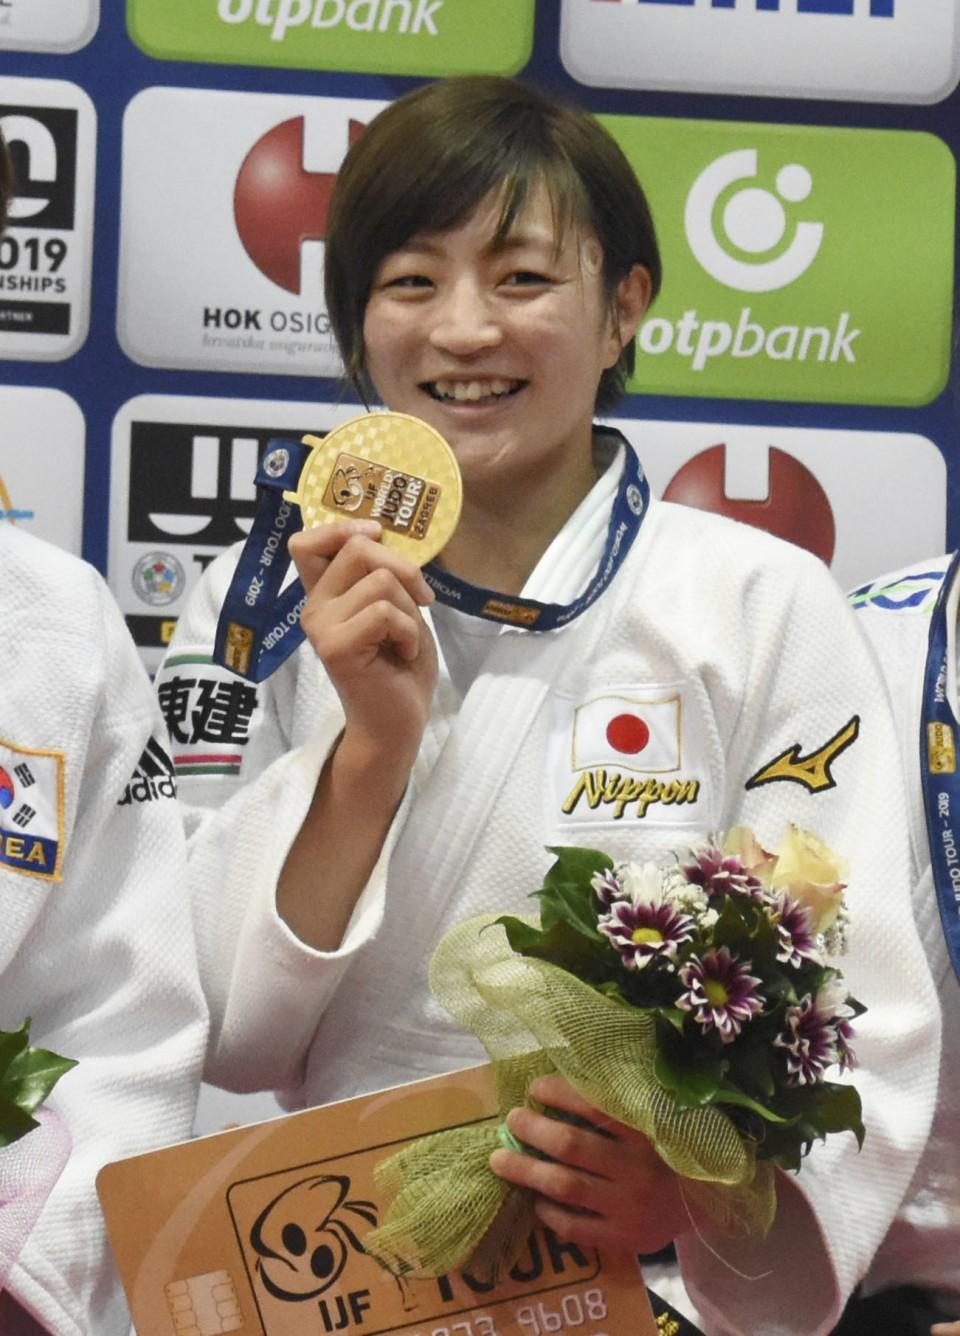 Judo: Japan's Natsumi Tsunoda wins gold at Zagreb Grand Prix